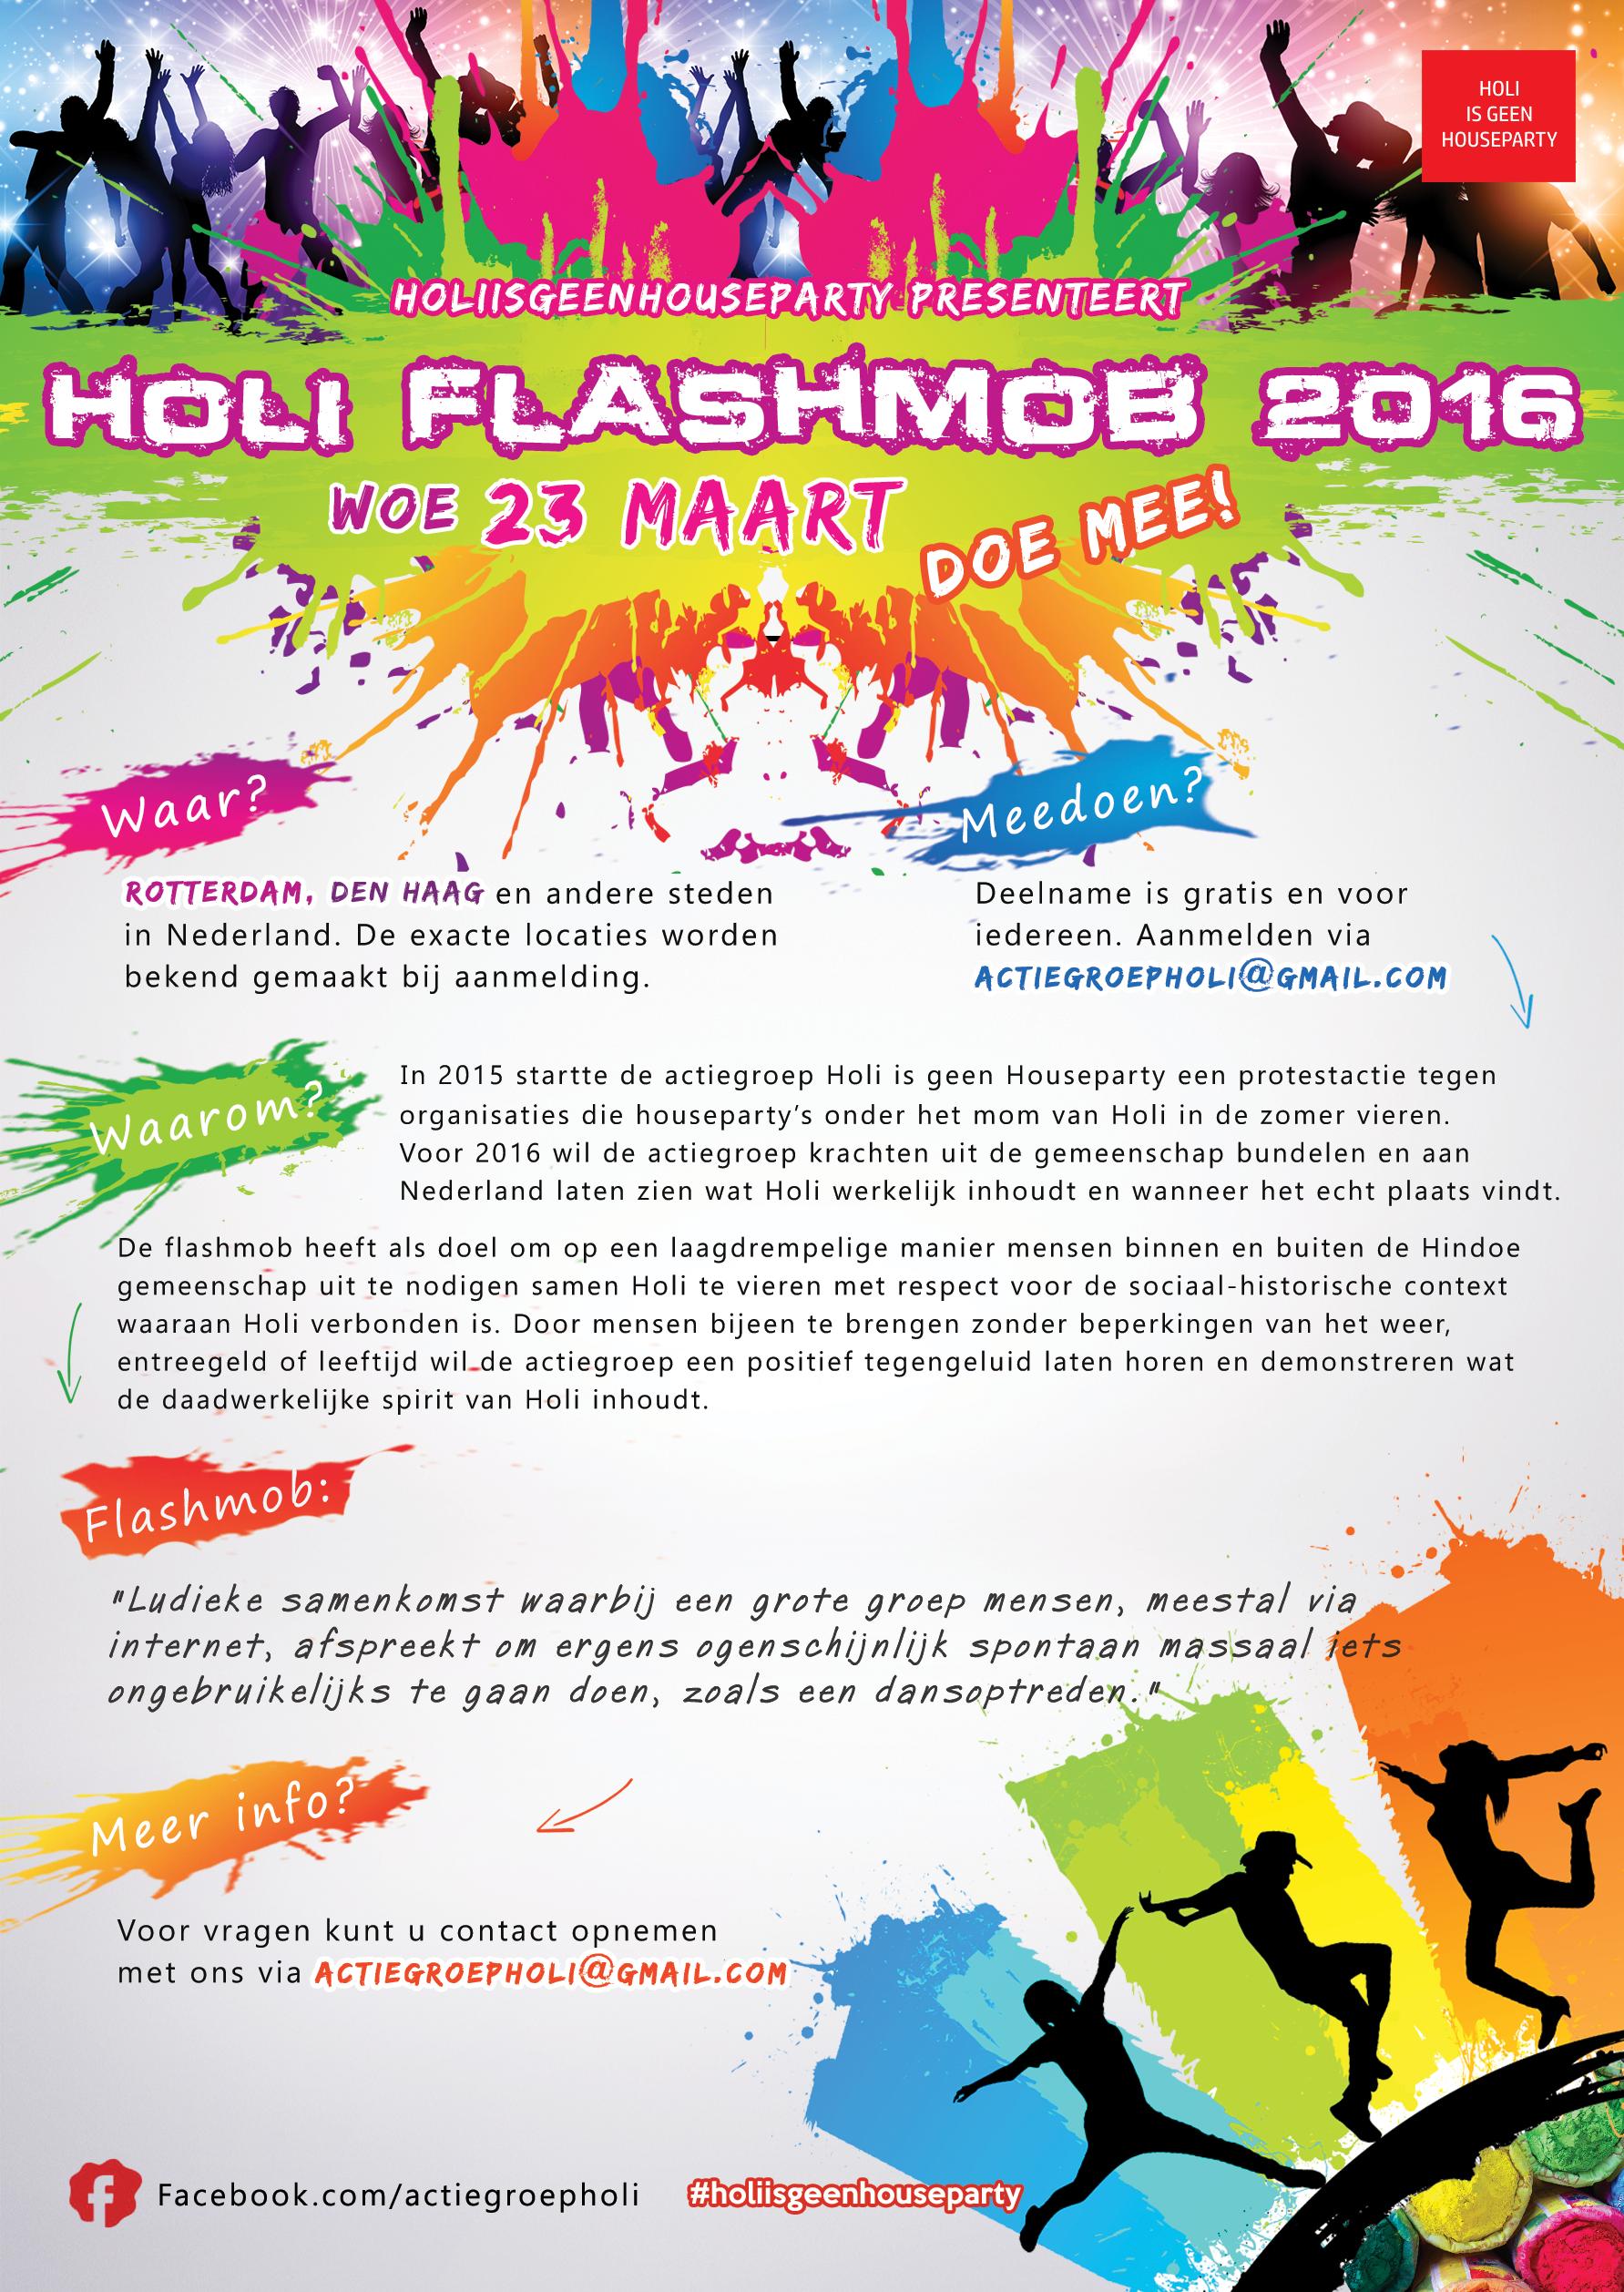 Holi Flashmob